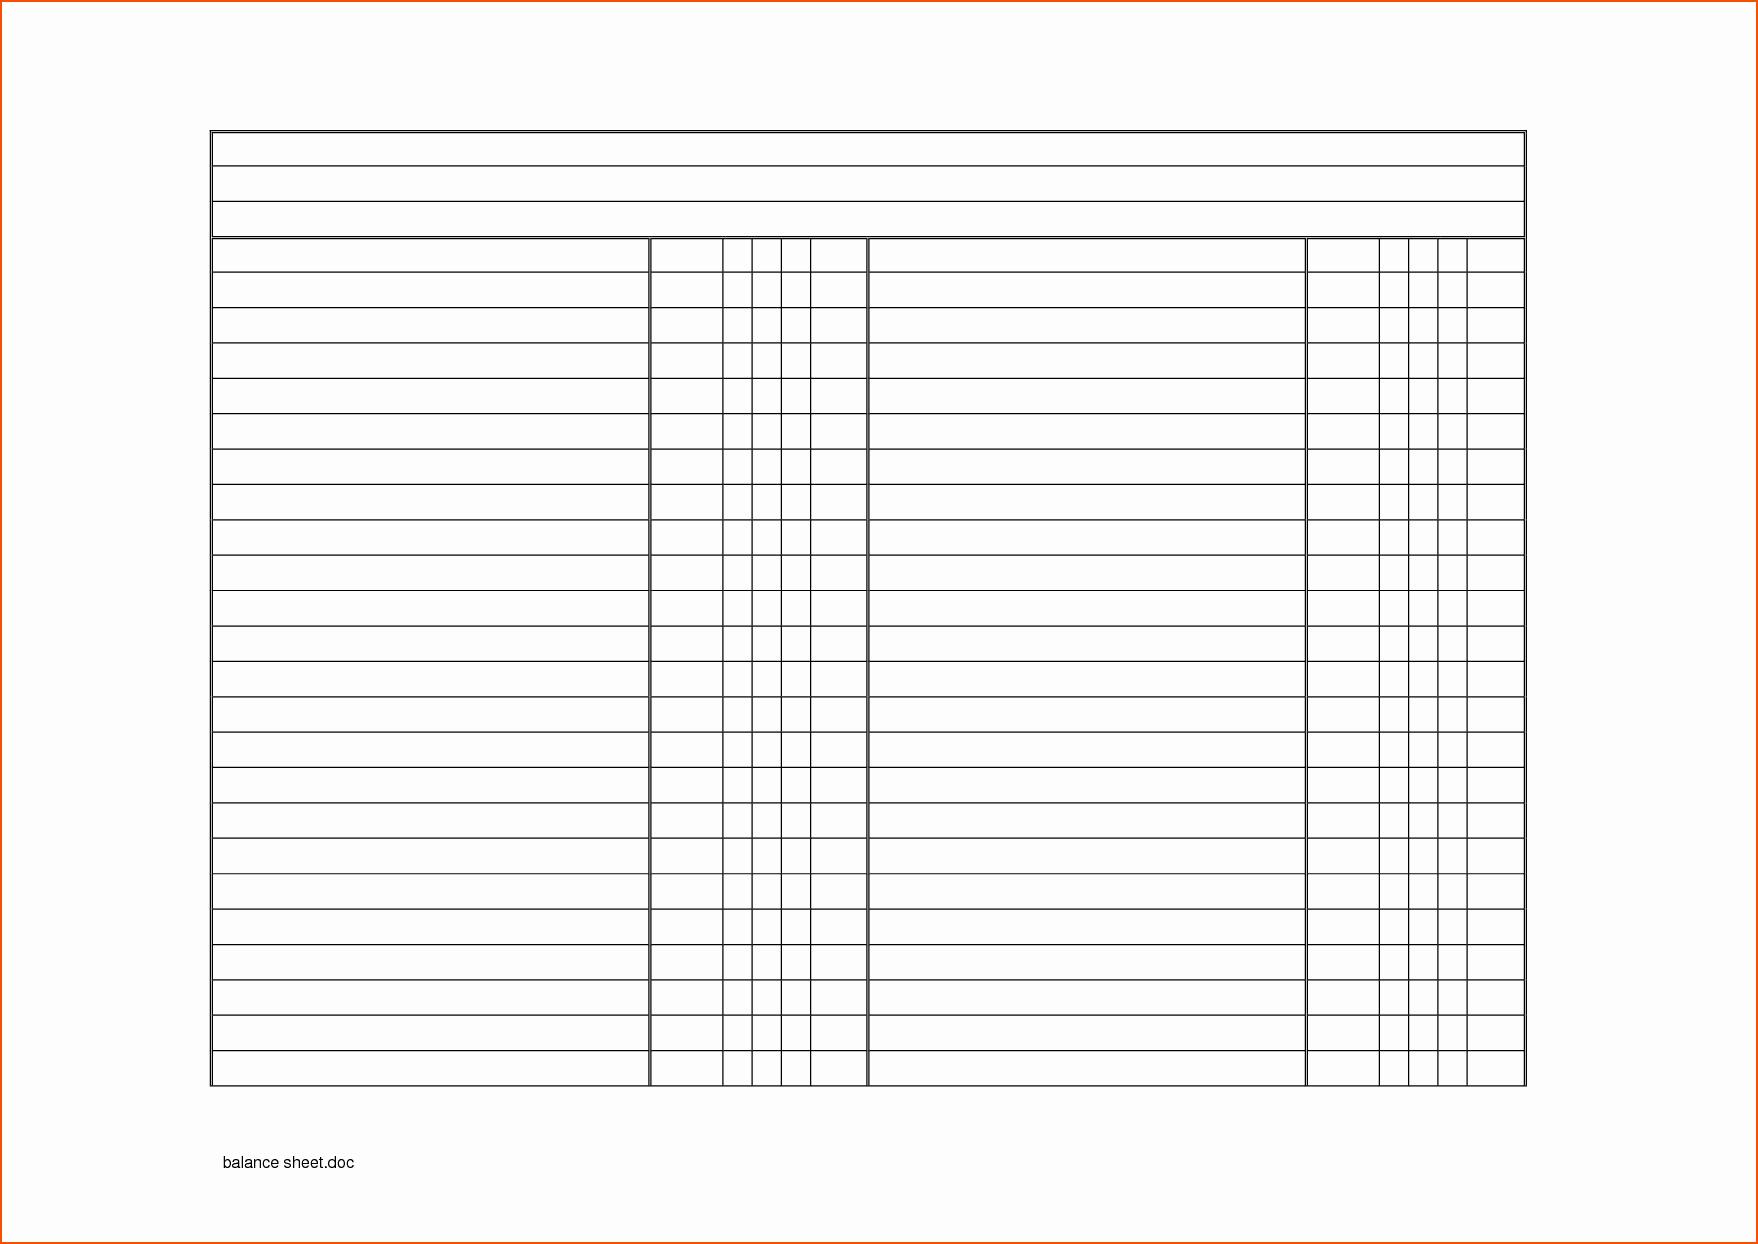 Checking Account Balance Sheet Template Fresh 8 Blank Balance Sheet Bookletemplate